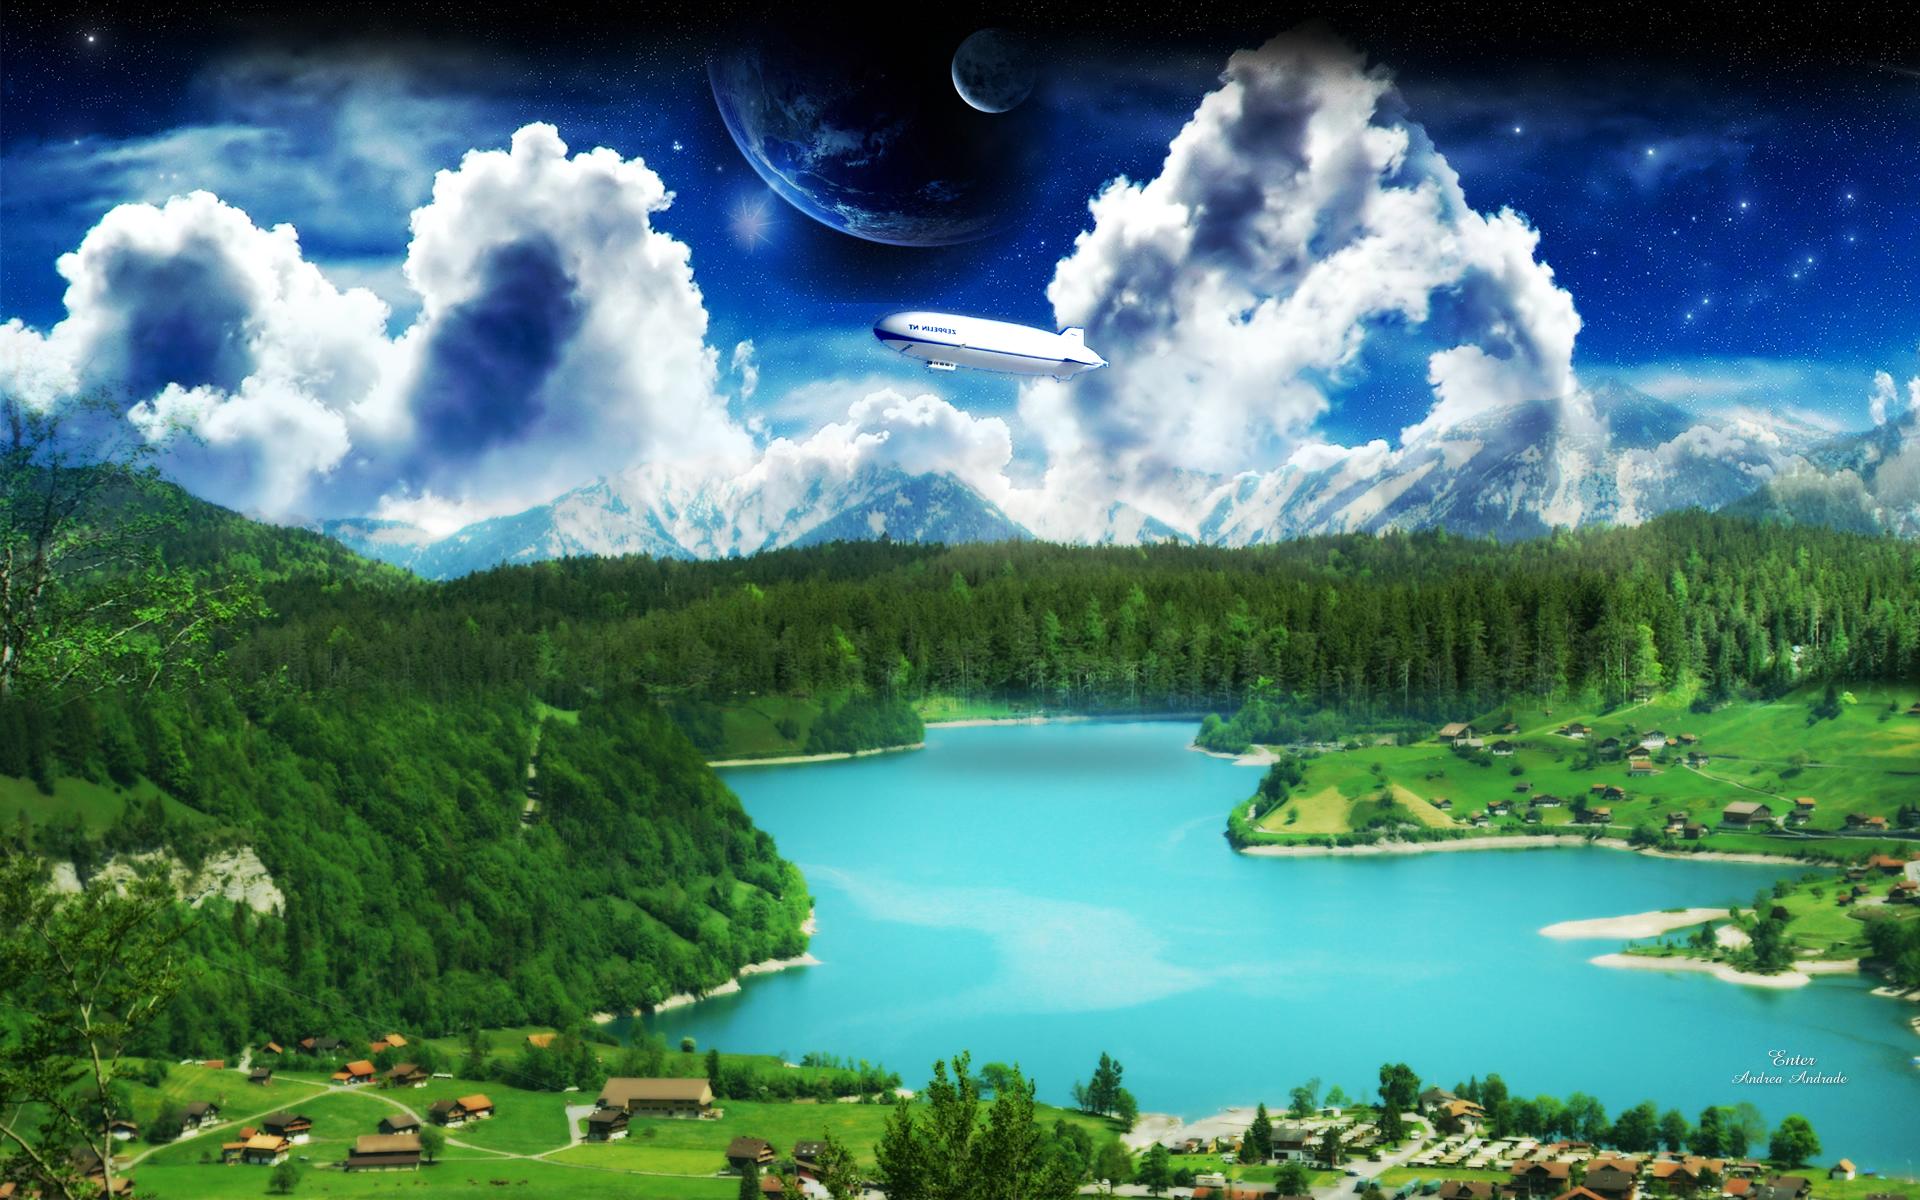 A Dreamy World HD Wallpaper